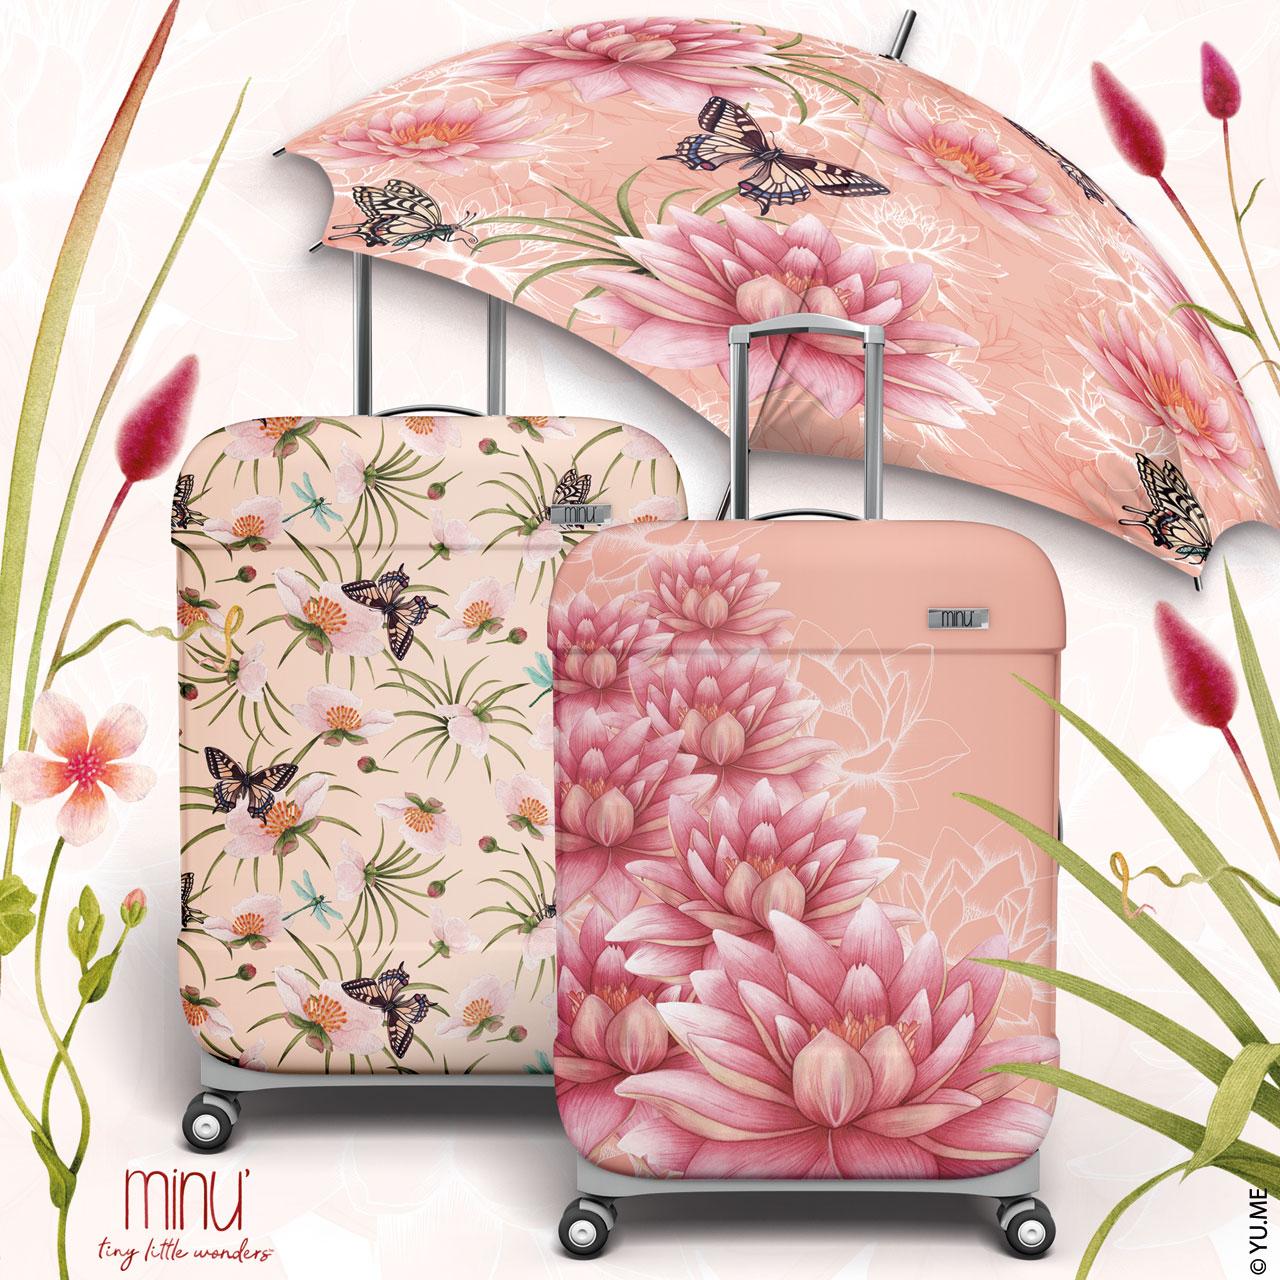 yu.me nature inspired luggage